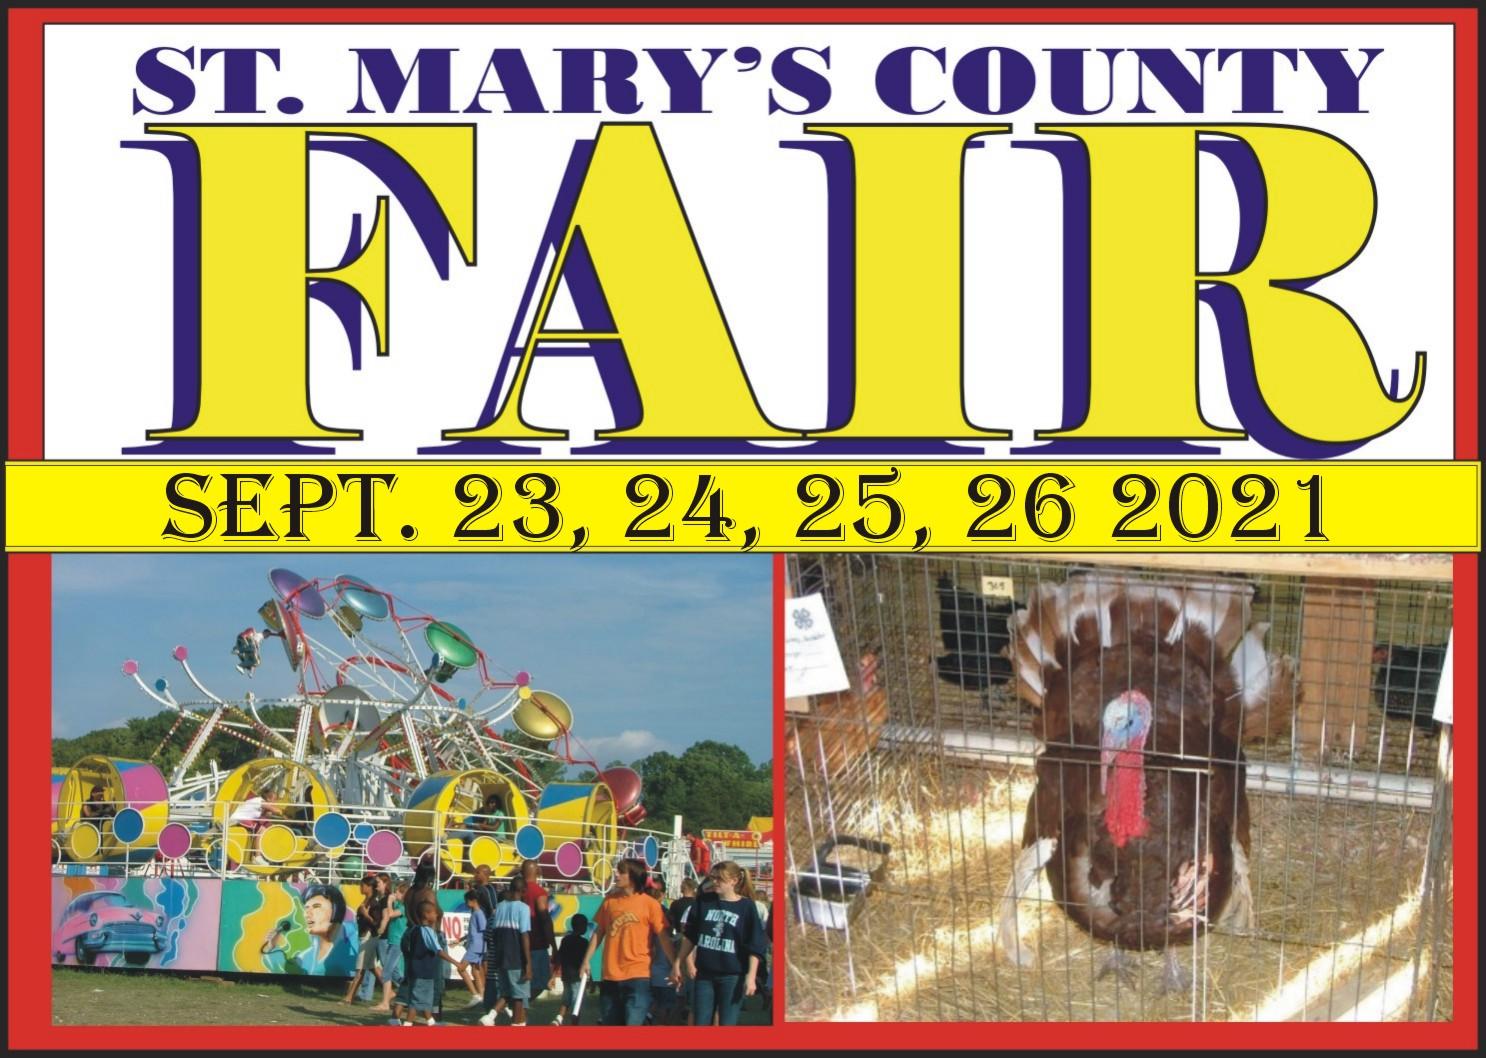 ST. MARY'S COUNTY FAIR PROGRAM 74TH ANNUAL FOR 2021